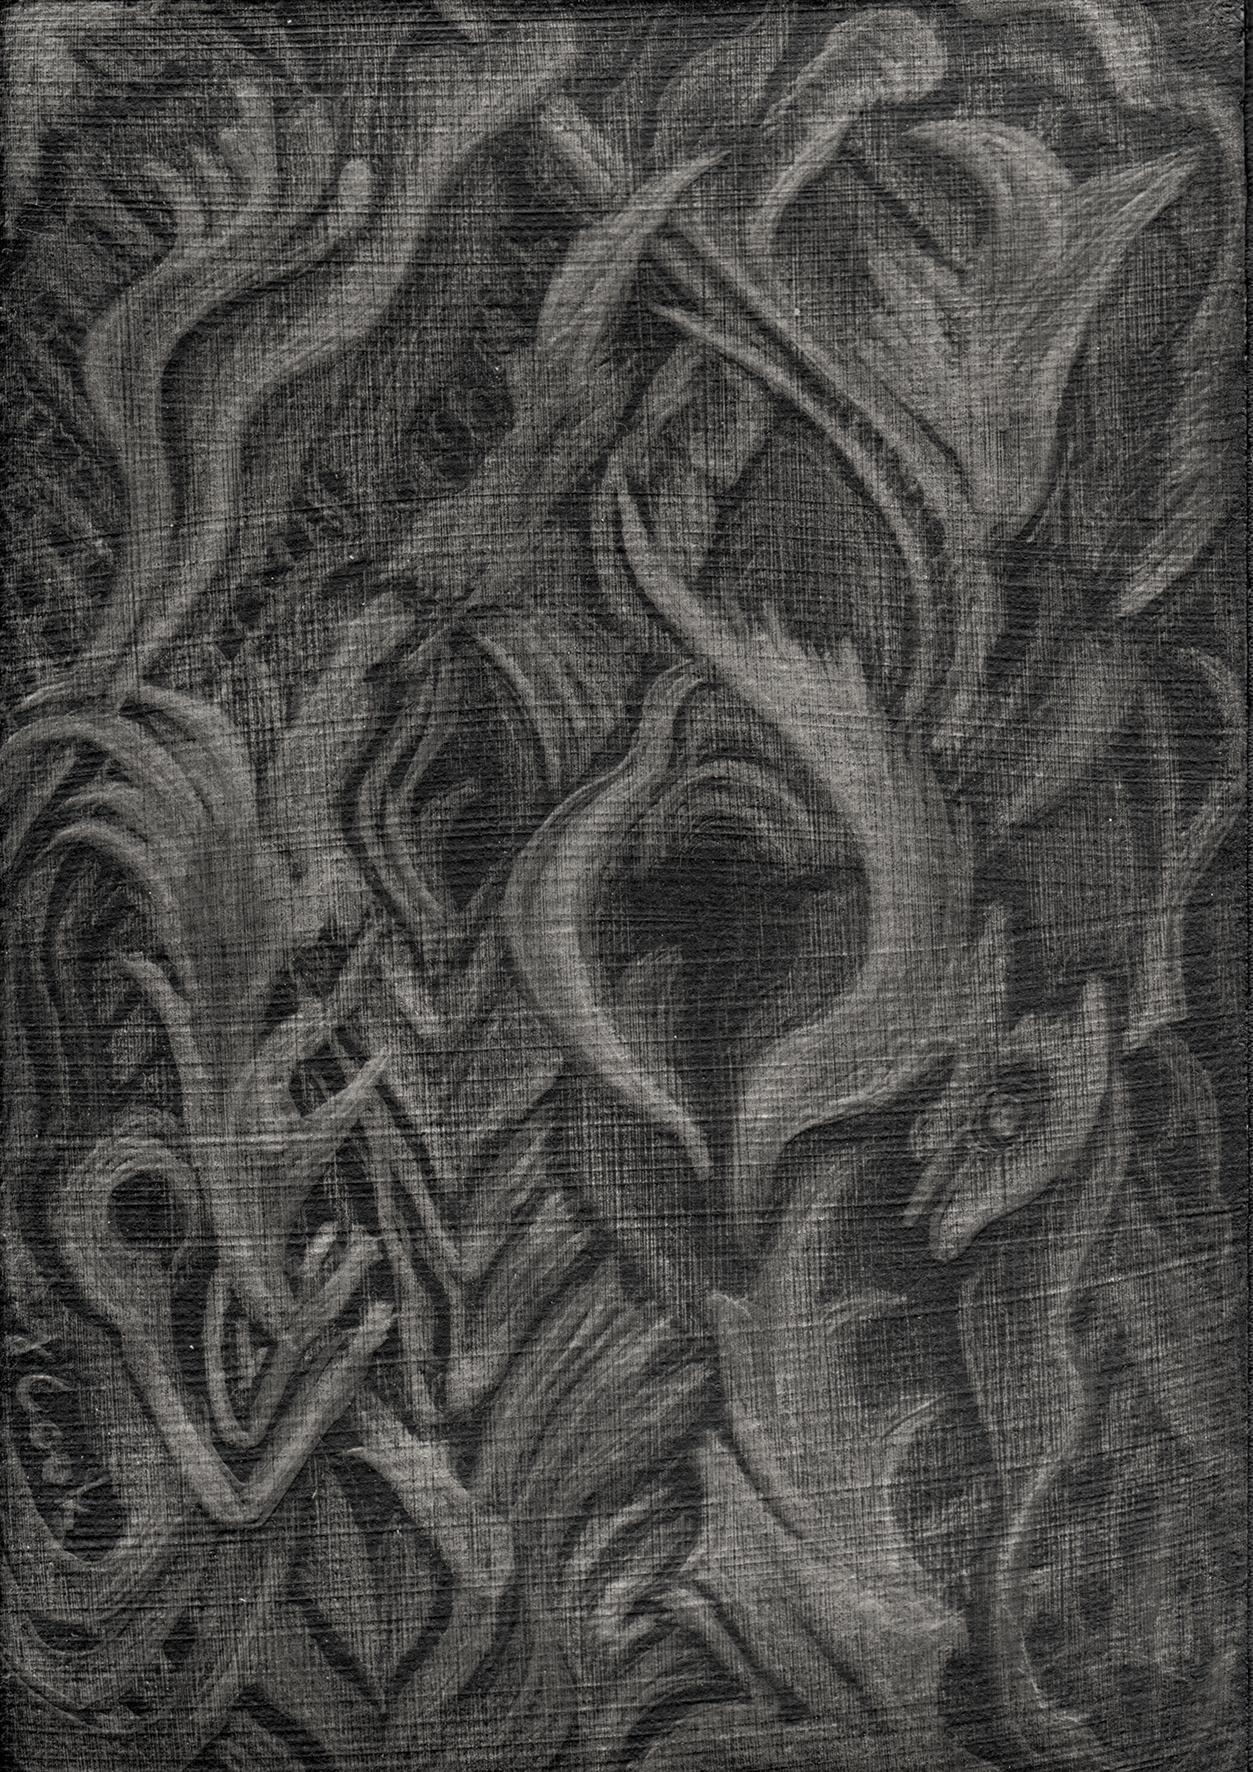 Apoyos II - Eucalyptus tree bark - silverpoint, Jeannine Cook artist